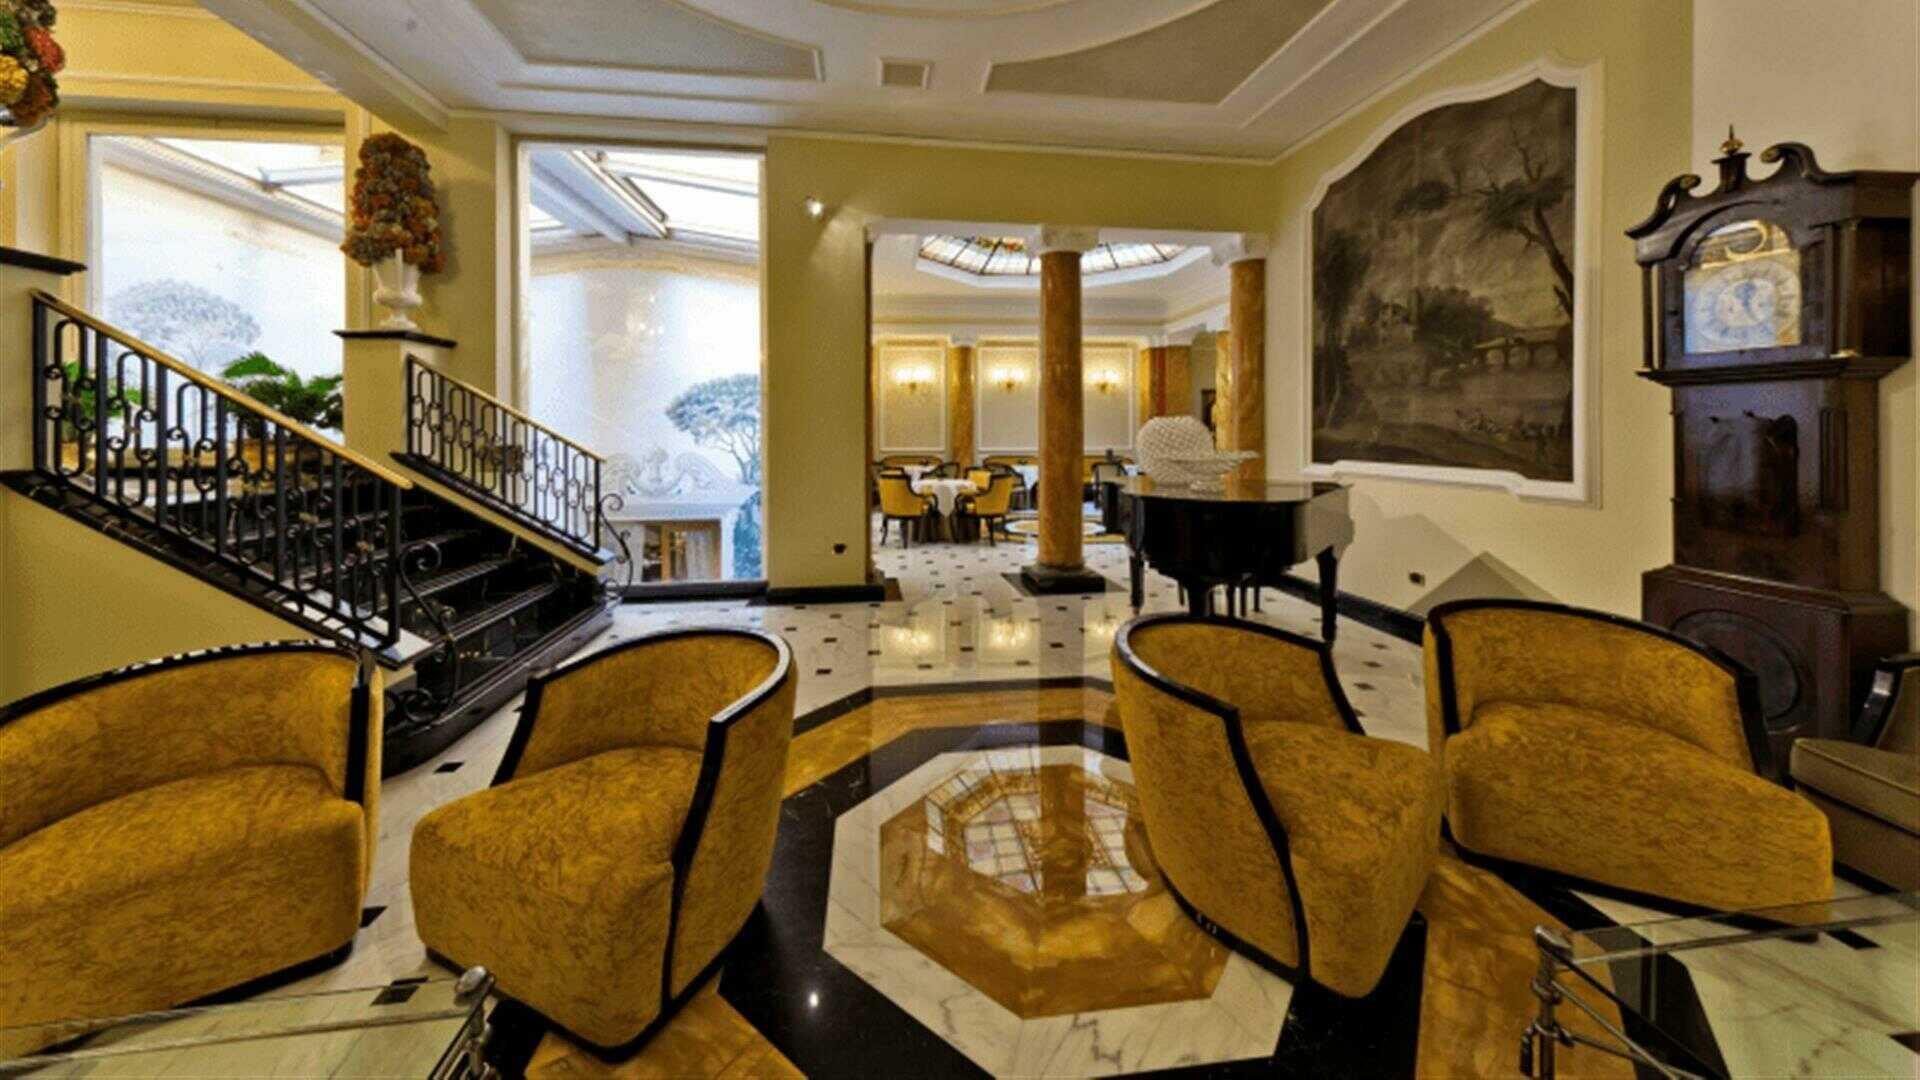 Meeting Rooms At Grand Hotel Majestic Gia Baglioni Bologna